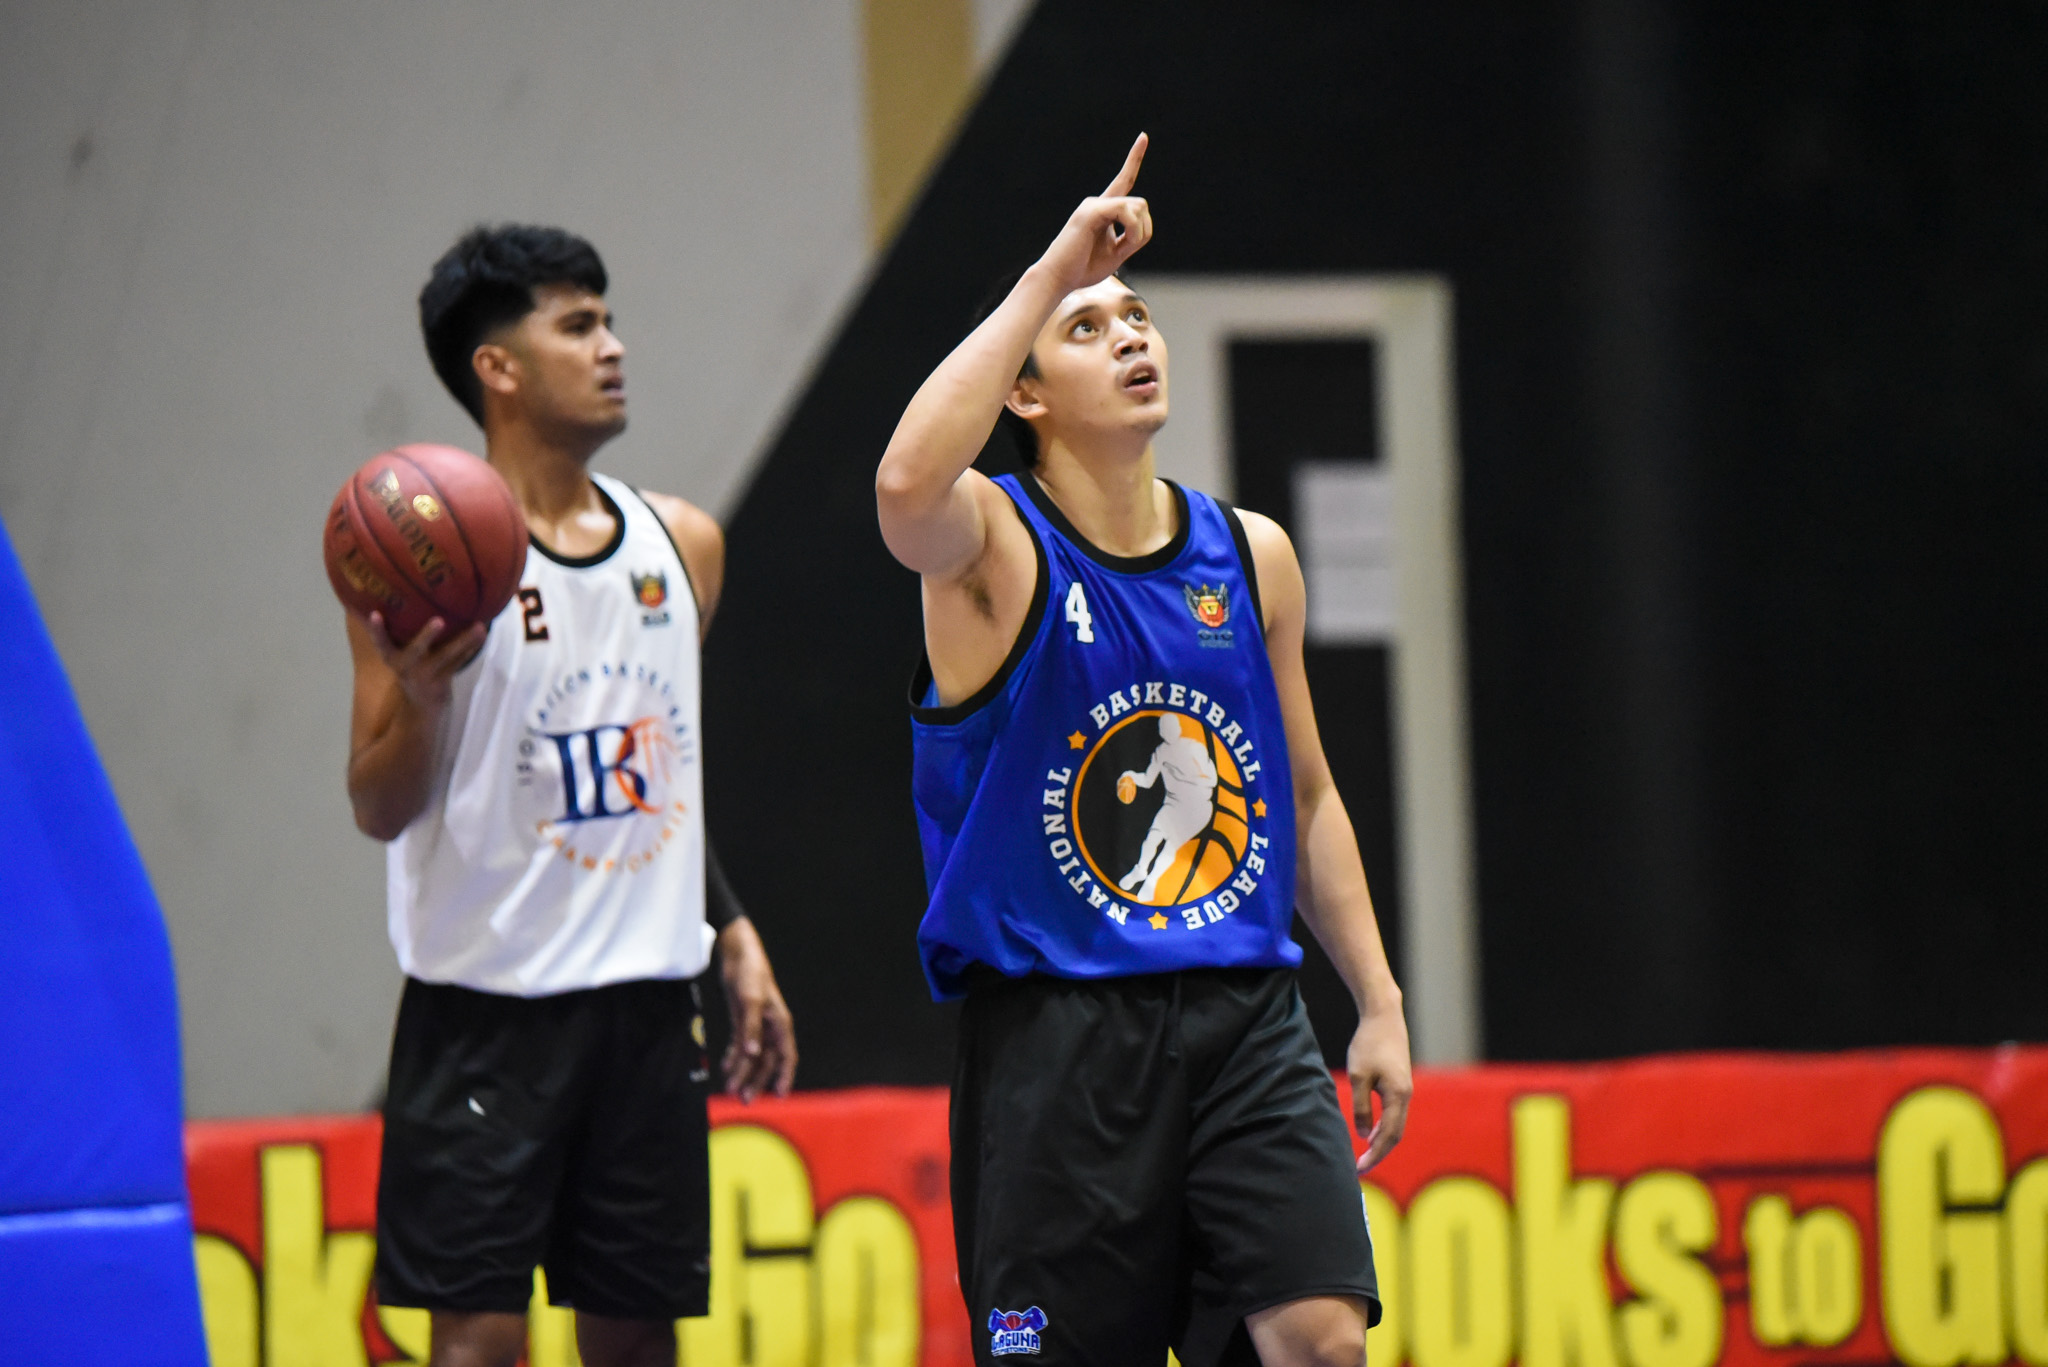 NBL-IBC-1v1-Games_Men-Welterweight_Amil Lim outlasts Penaranda as Paranaque Lady Aces dominate NBL-WNBL 1v1 1-on-1 NBL News  - philippine sports news